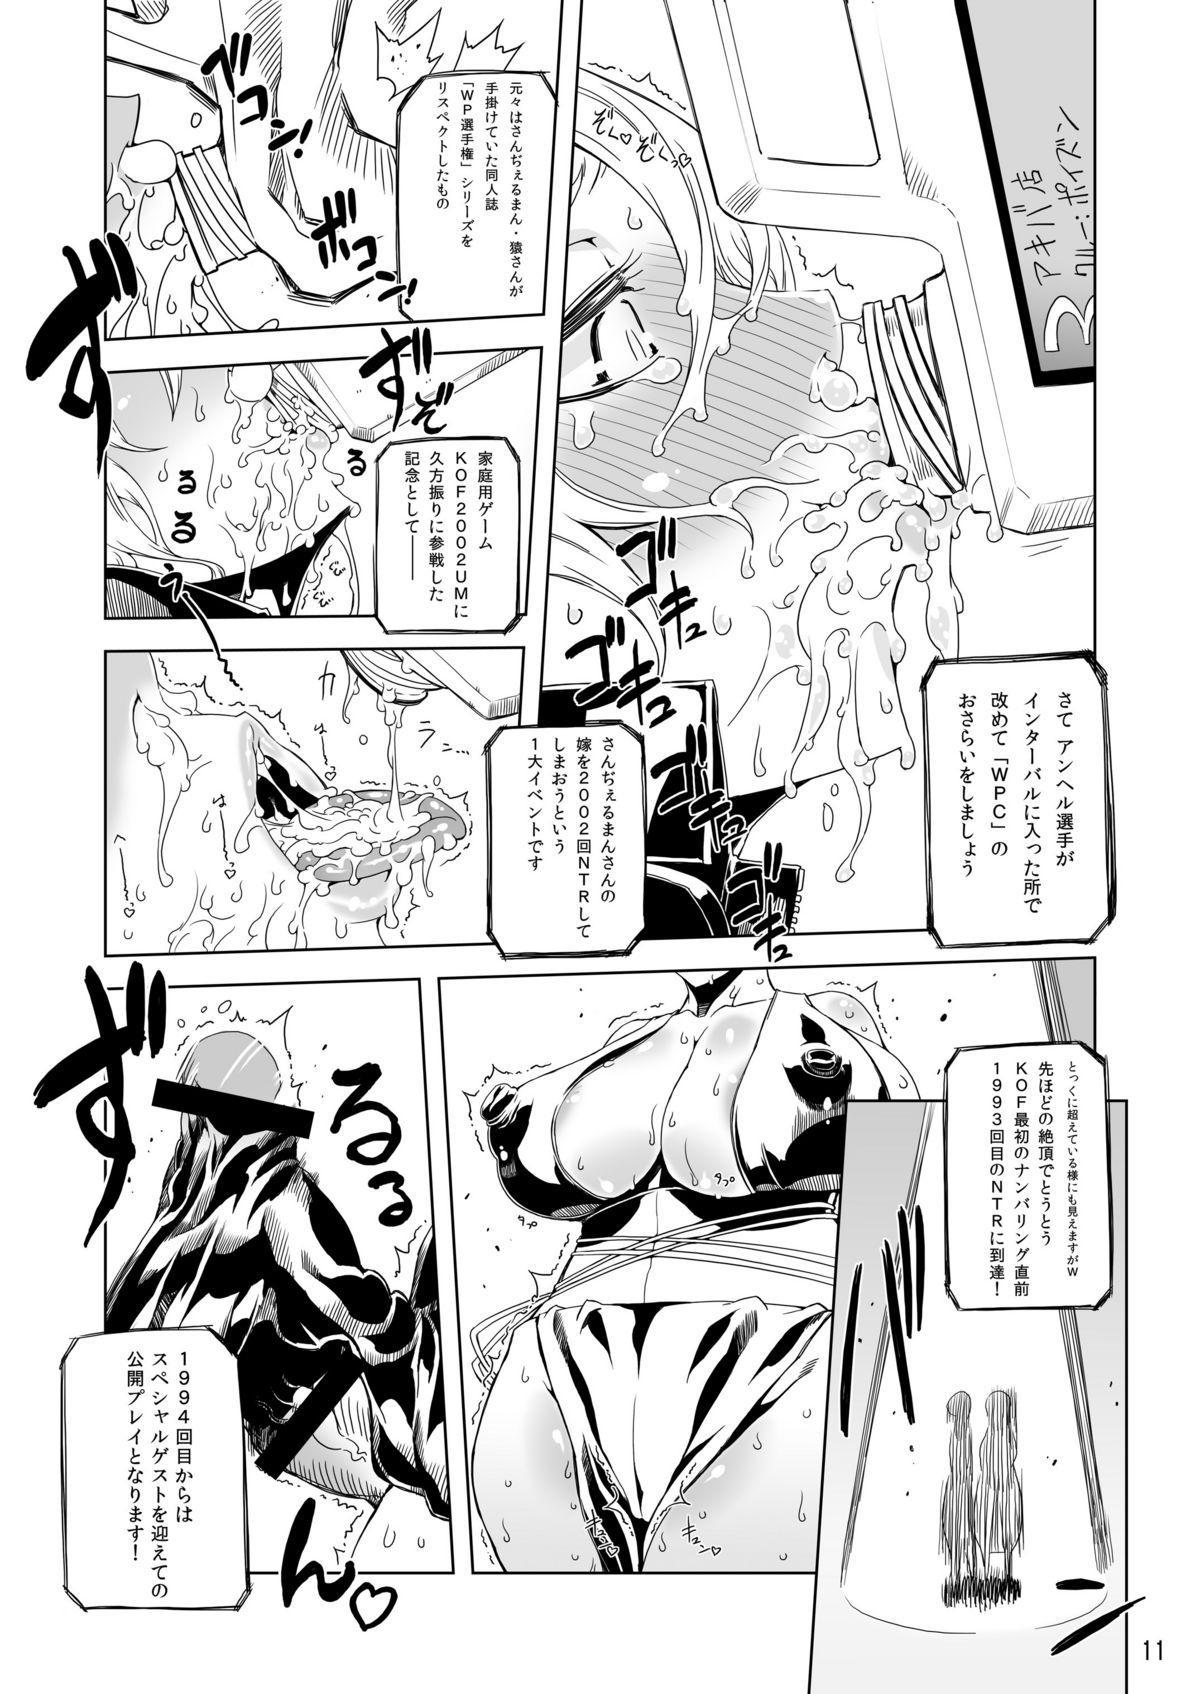 WPC Shinnihon Pepsitou Respect 10